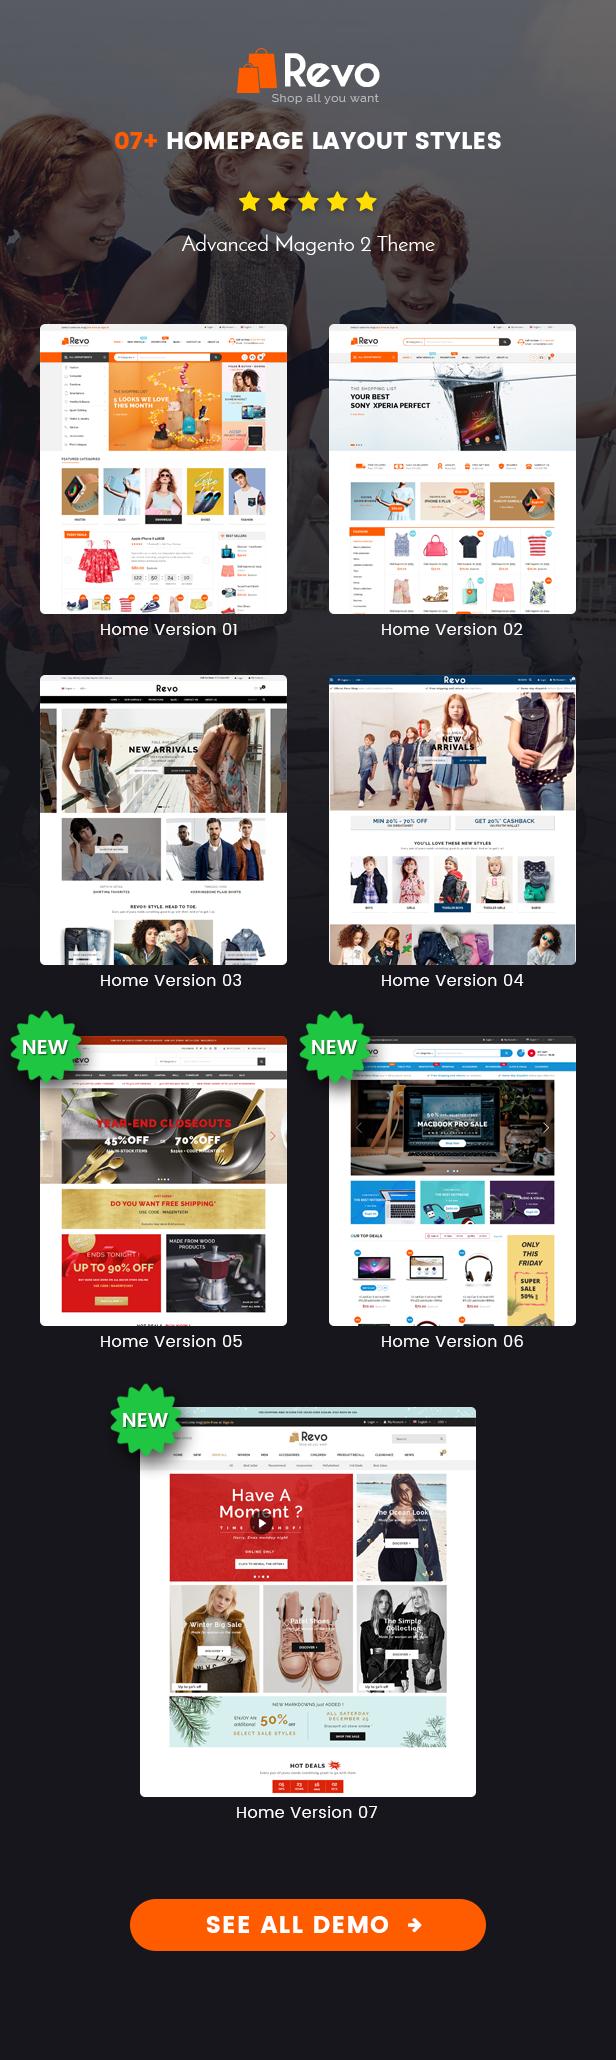 SM Revo - Homepage